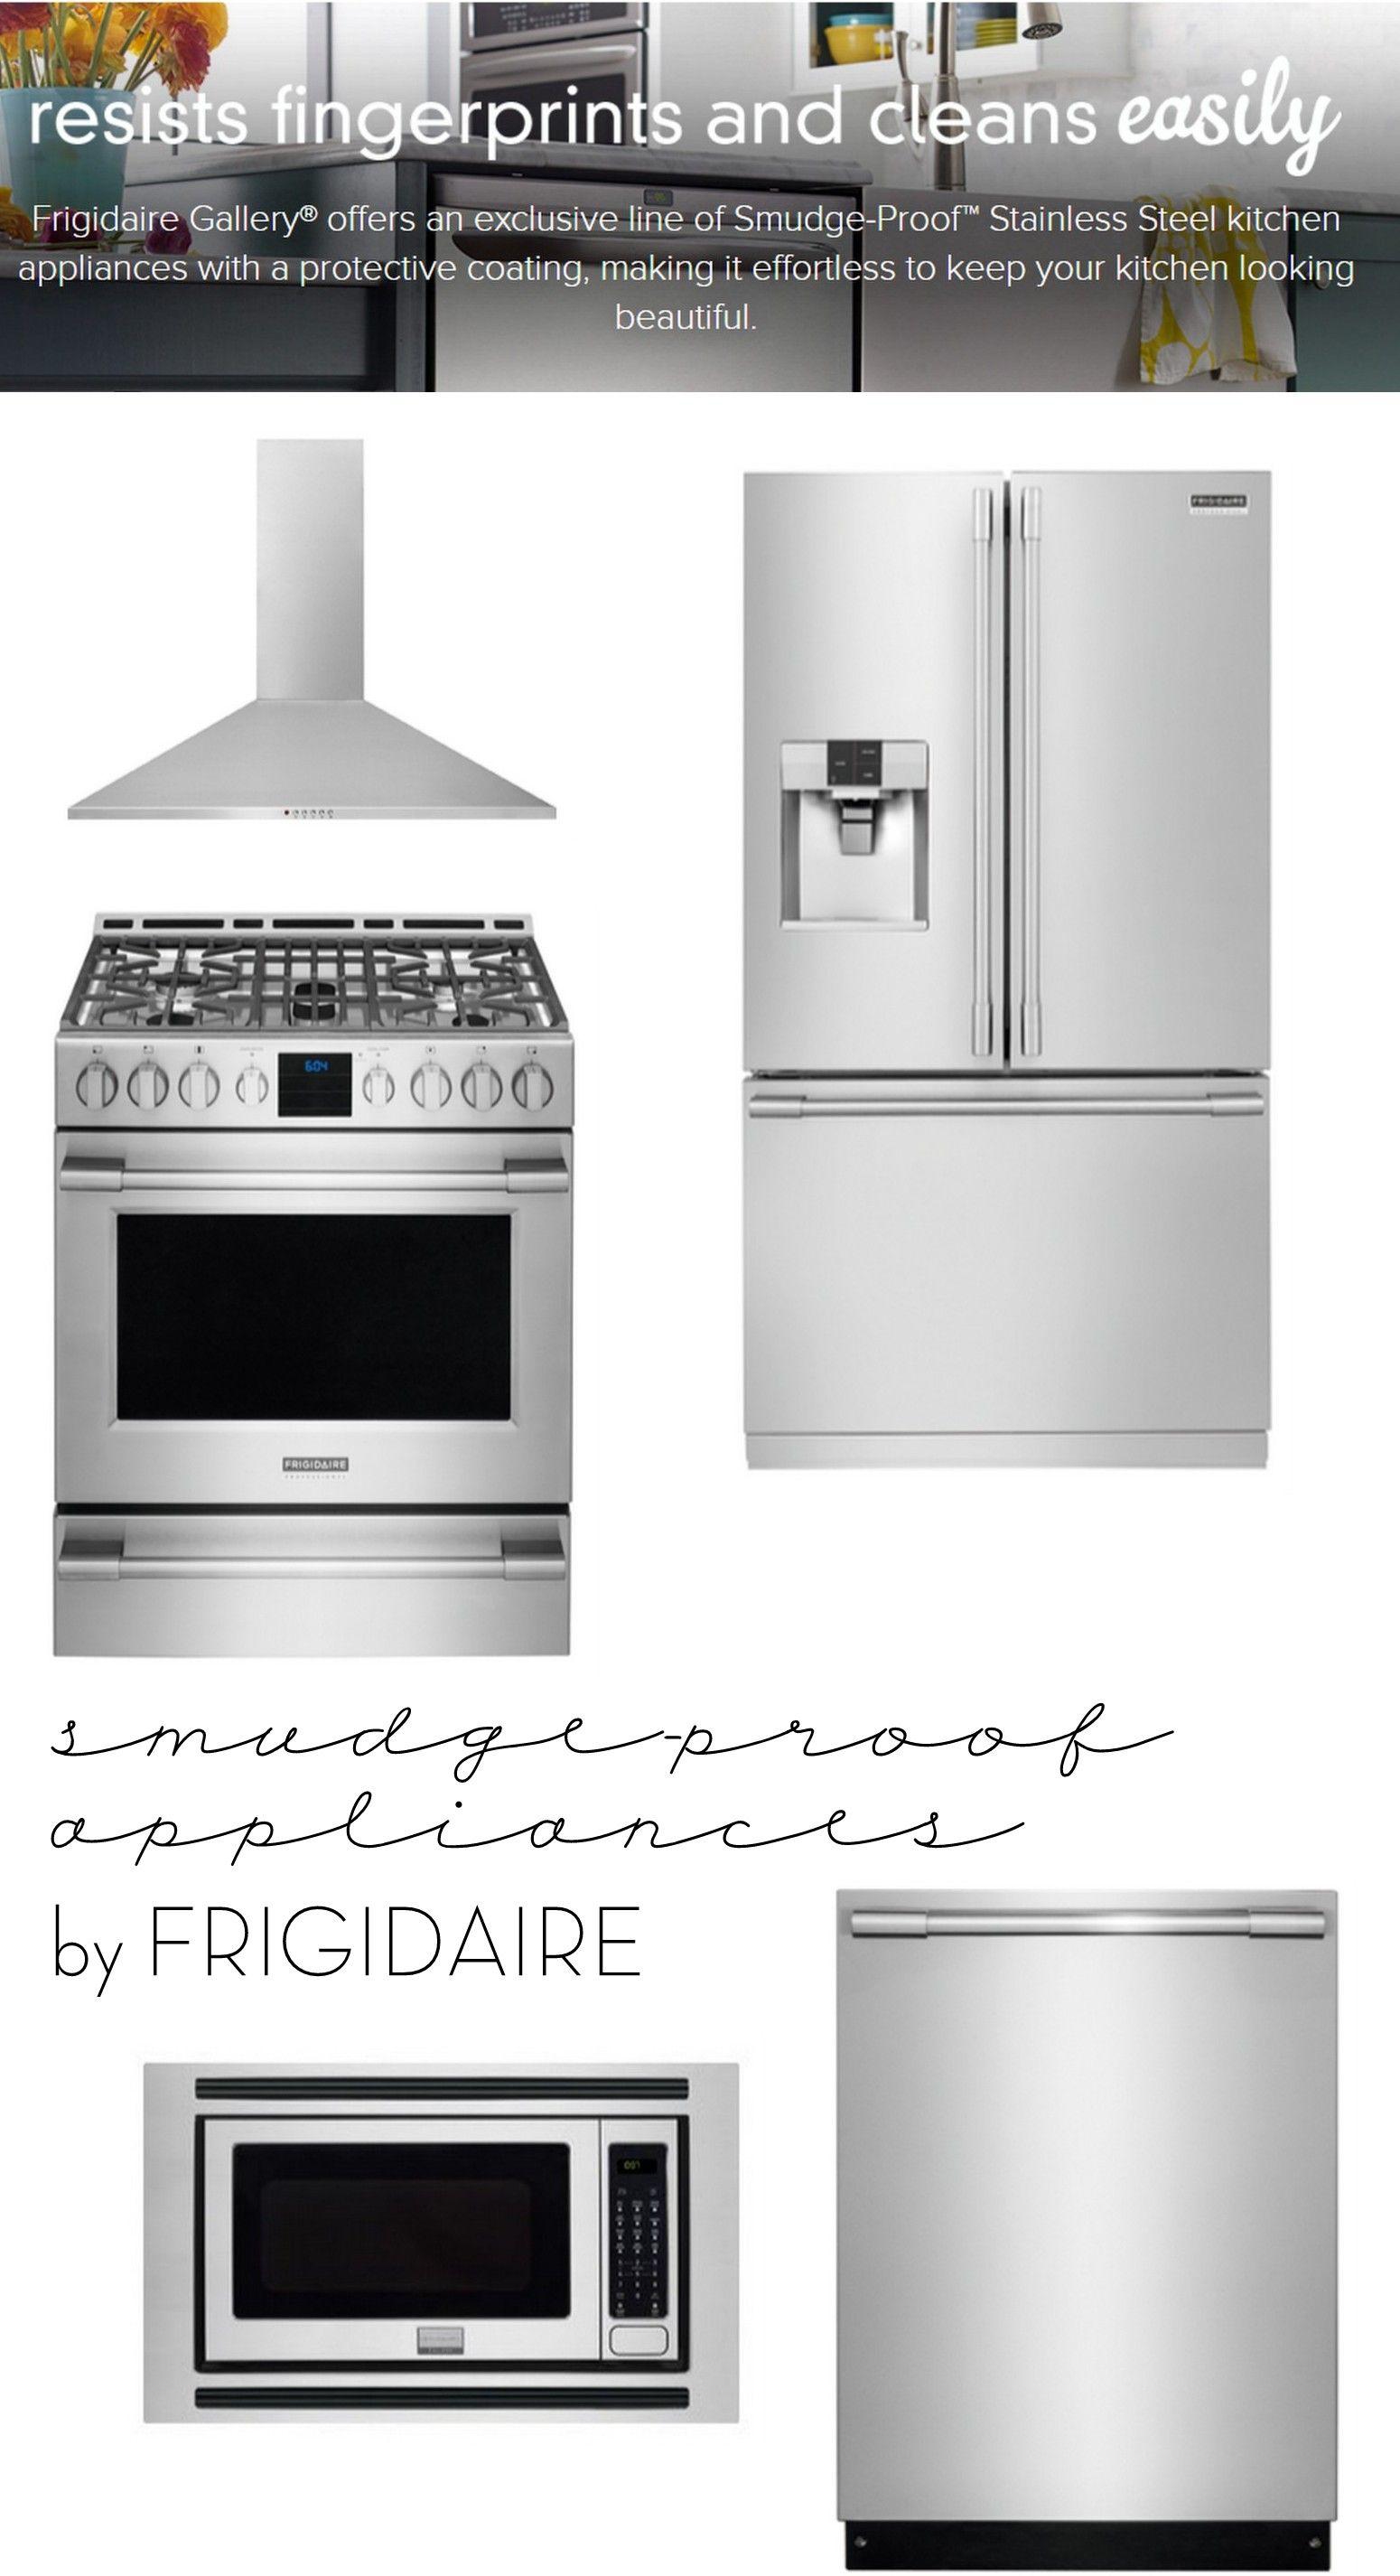 Resist Fingerprints On Your Appliances With SMUDGE-PROOF